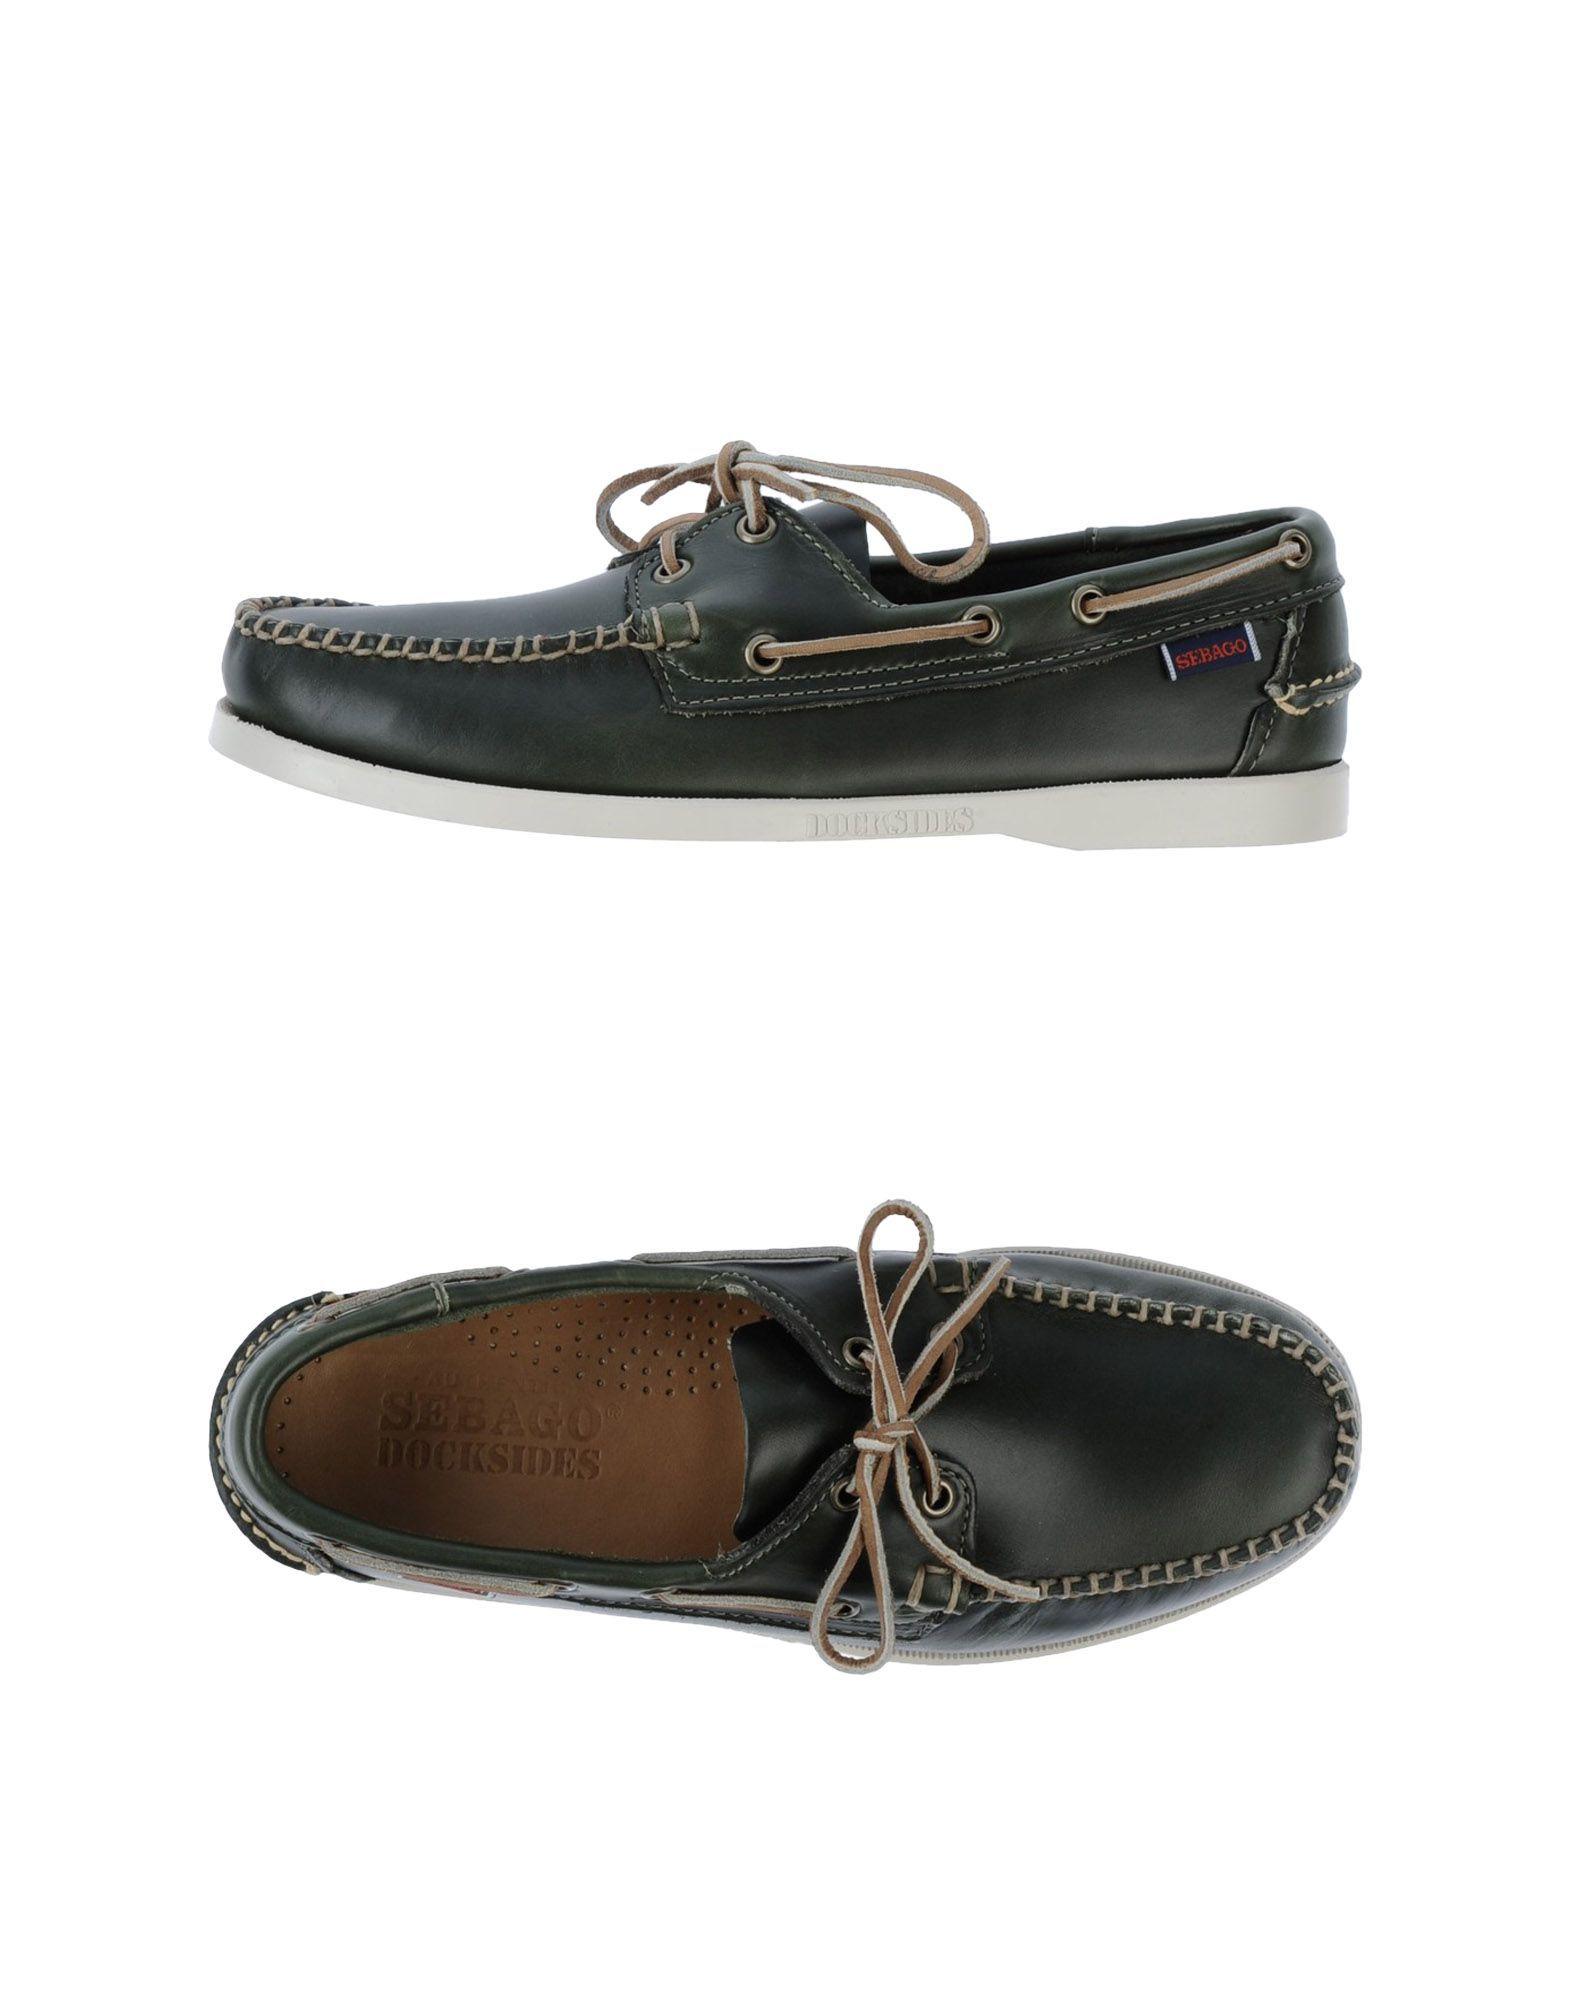 ad987771 Sebago docksides Men - Footwear - Moccasins Sebago docksides on YOOX ...